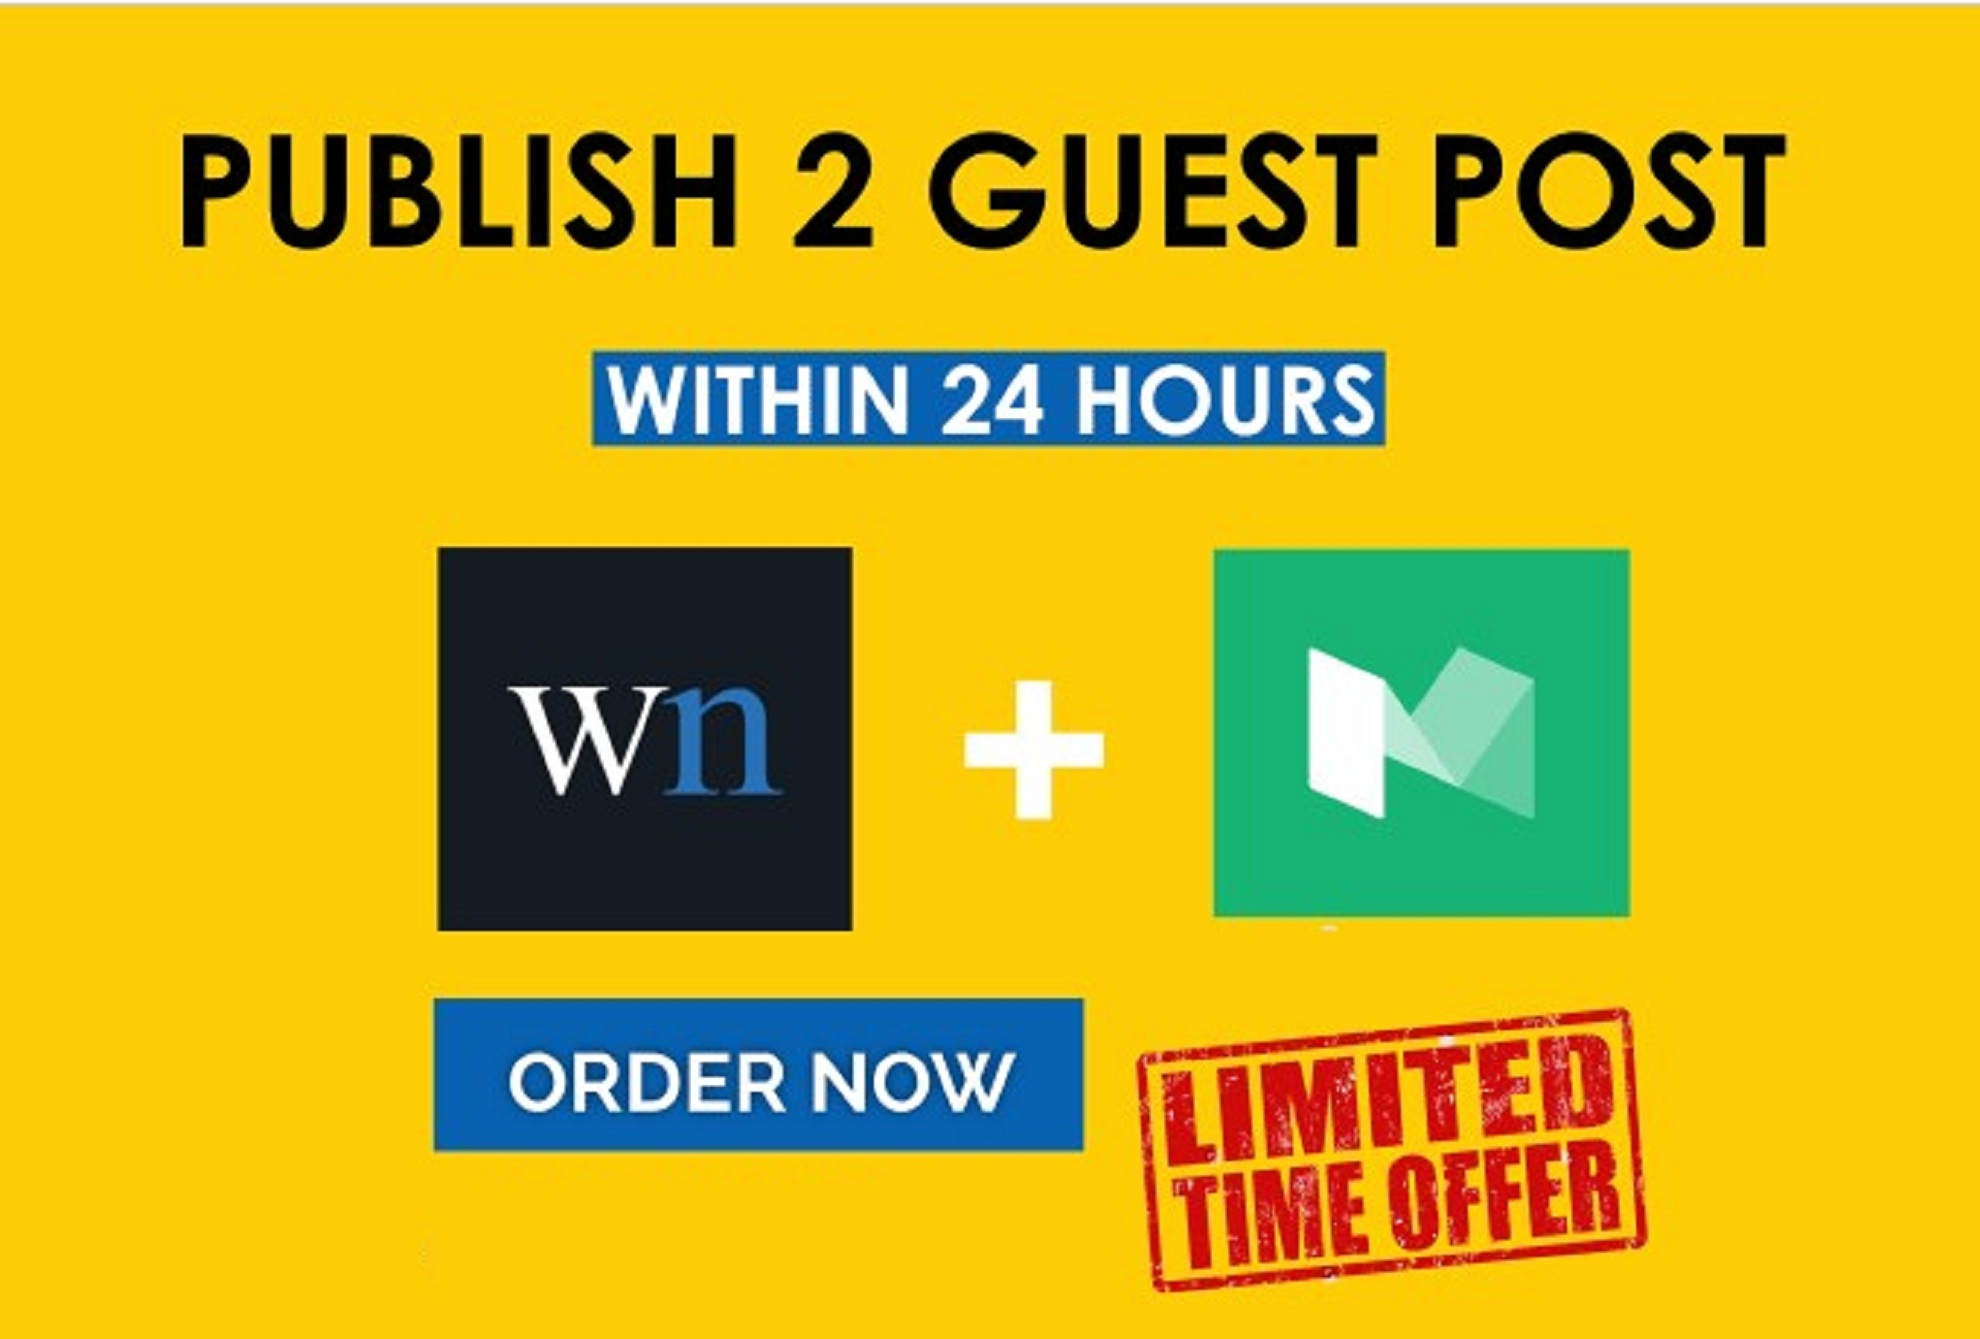 2X Publish Guest Post On WN.com DA:82+ & Medium.com DA:92+ Within 8 Hrs